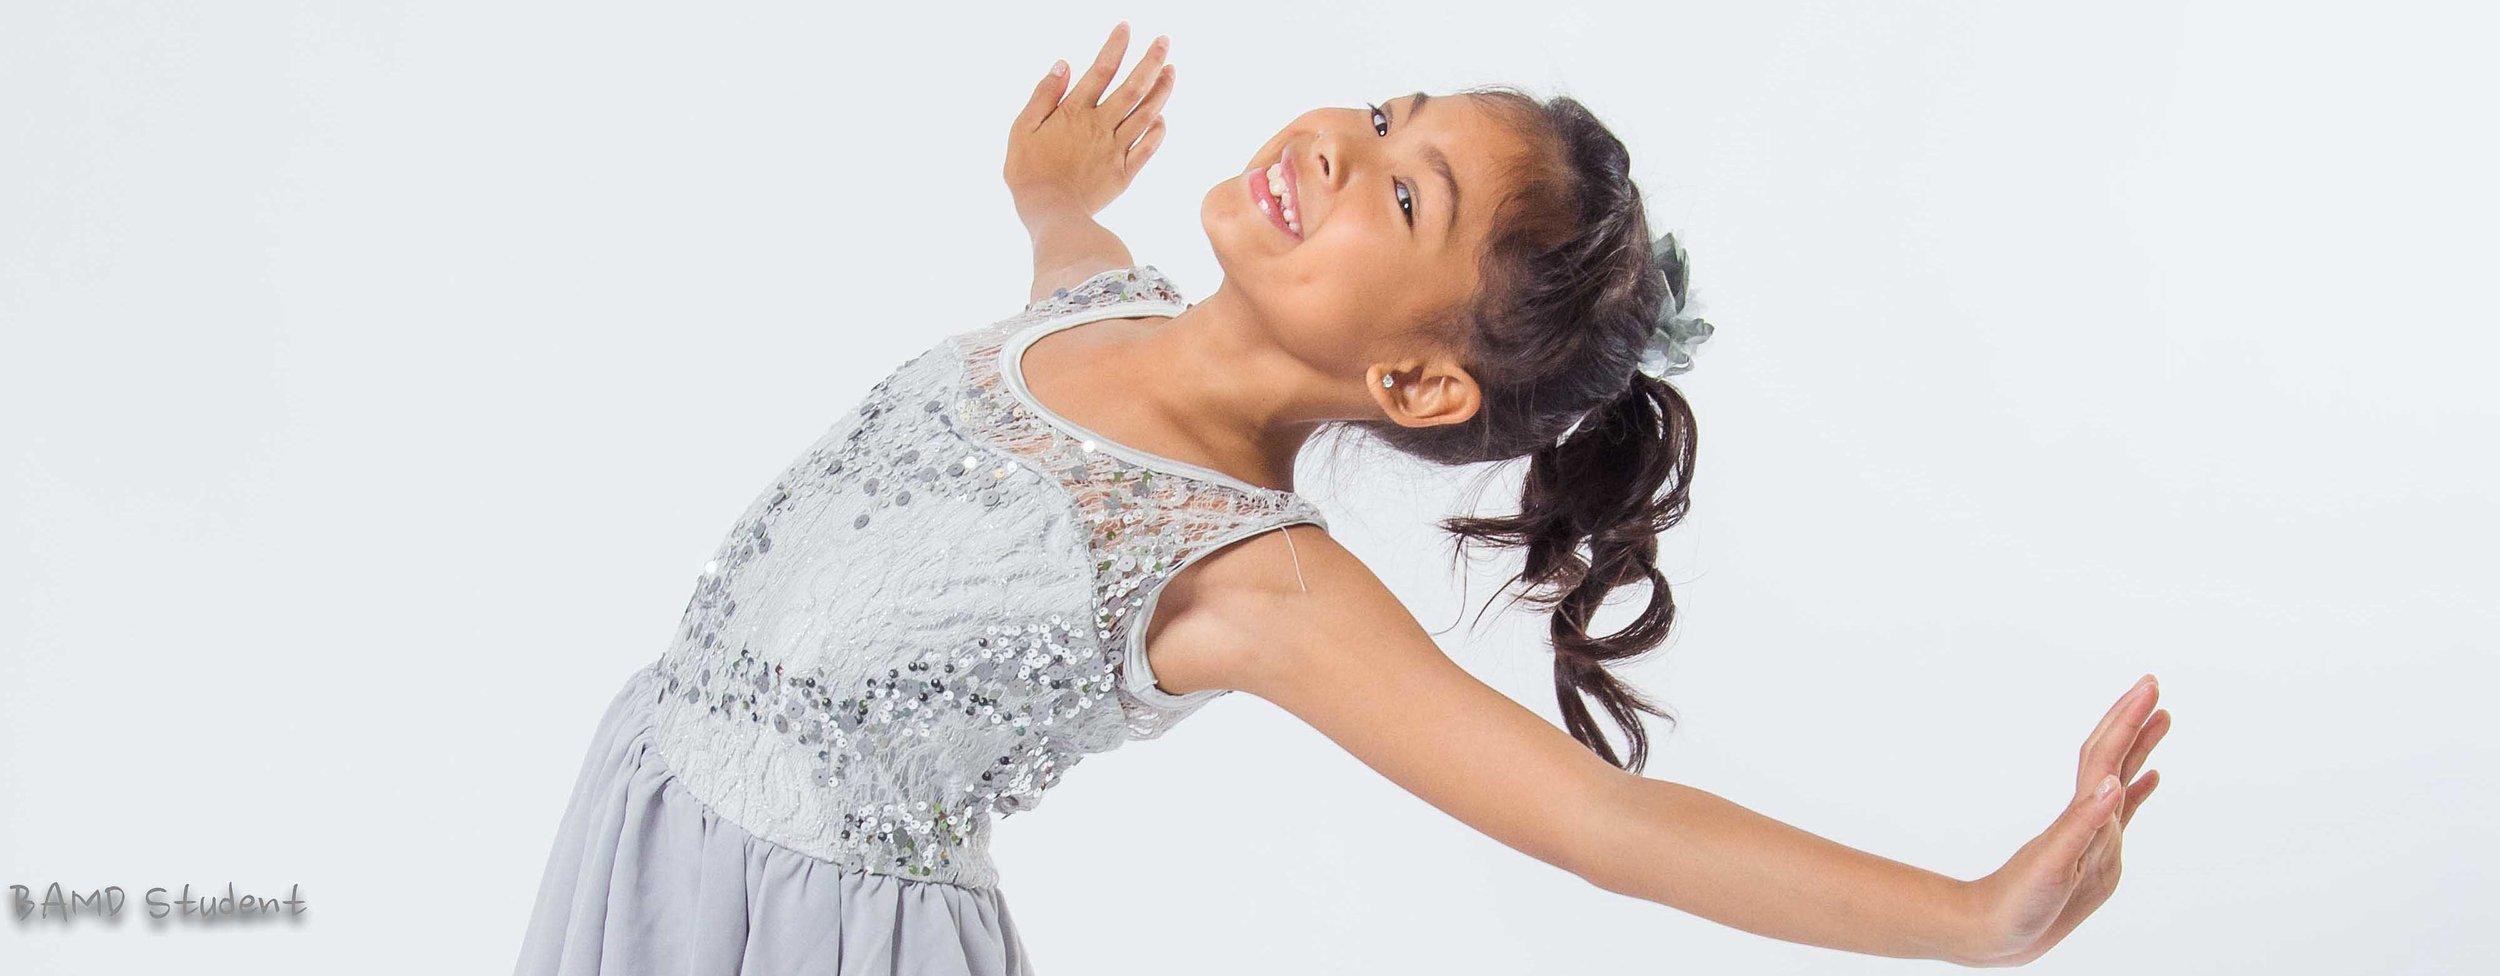 ballard music and dance photos-11.jpg